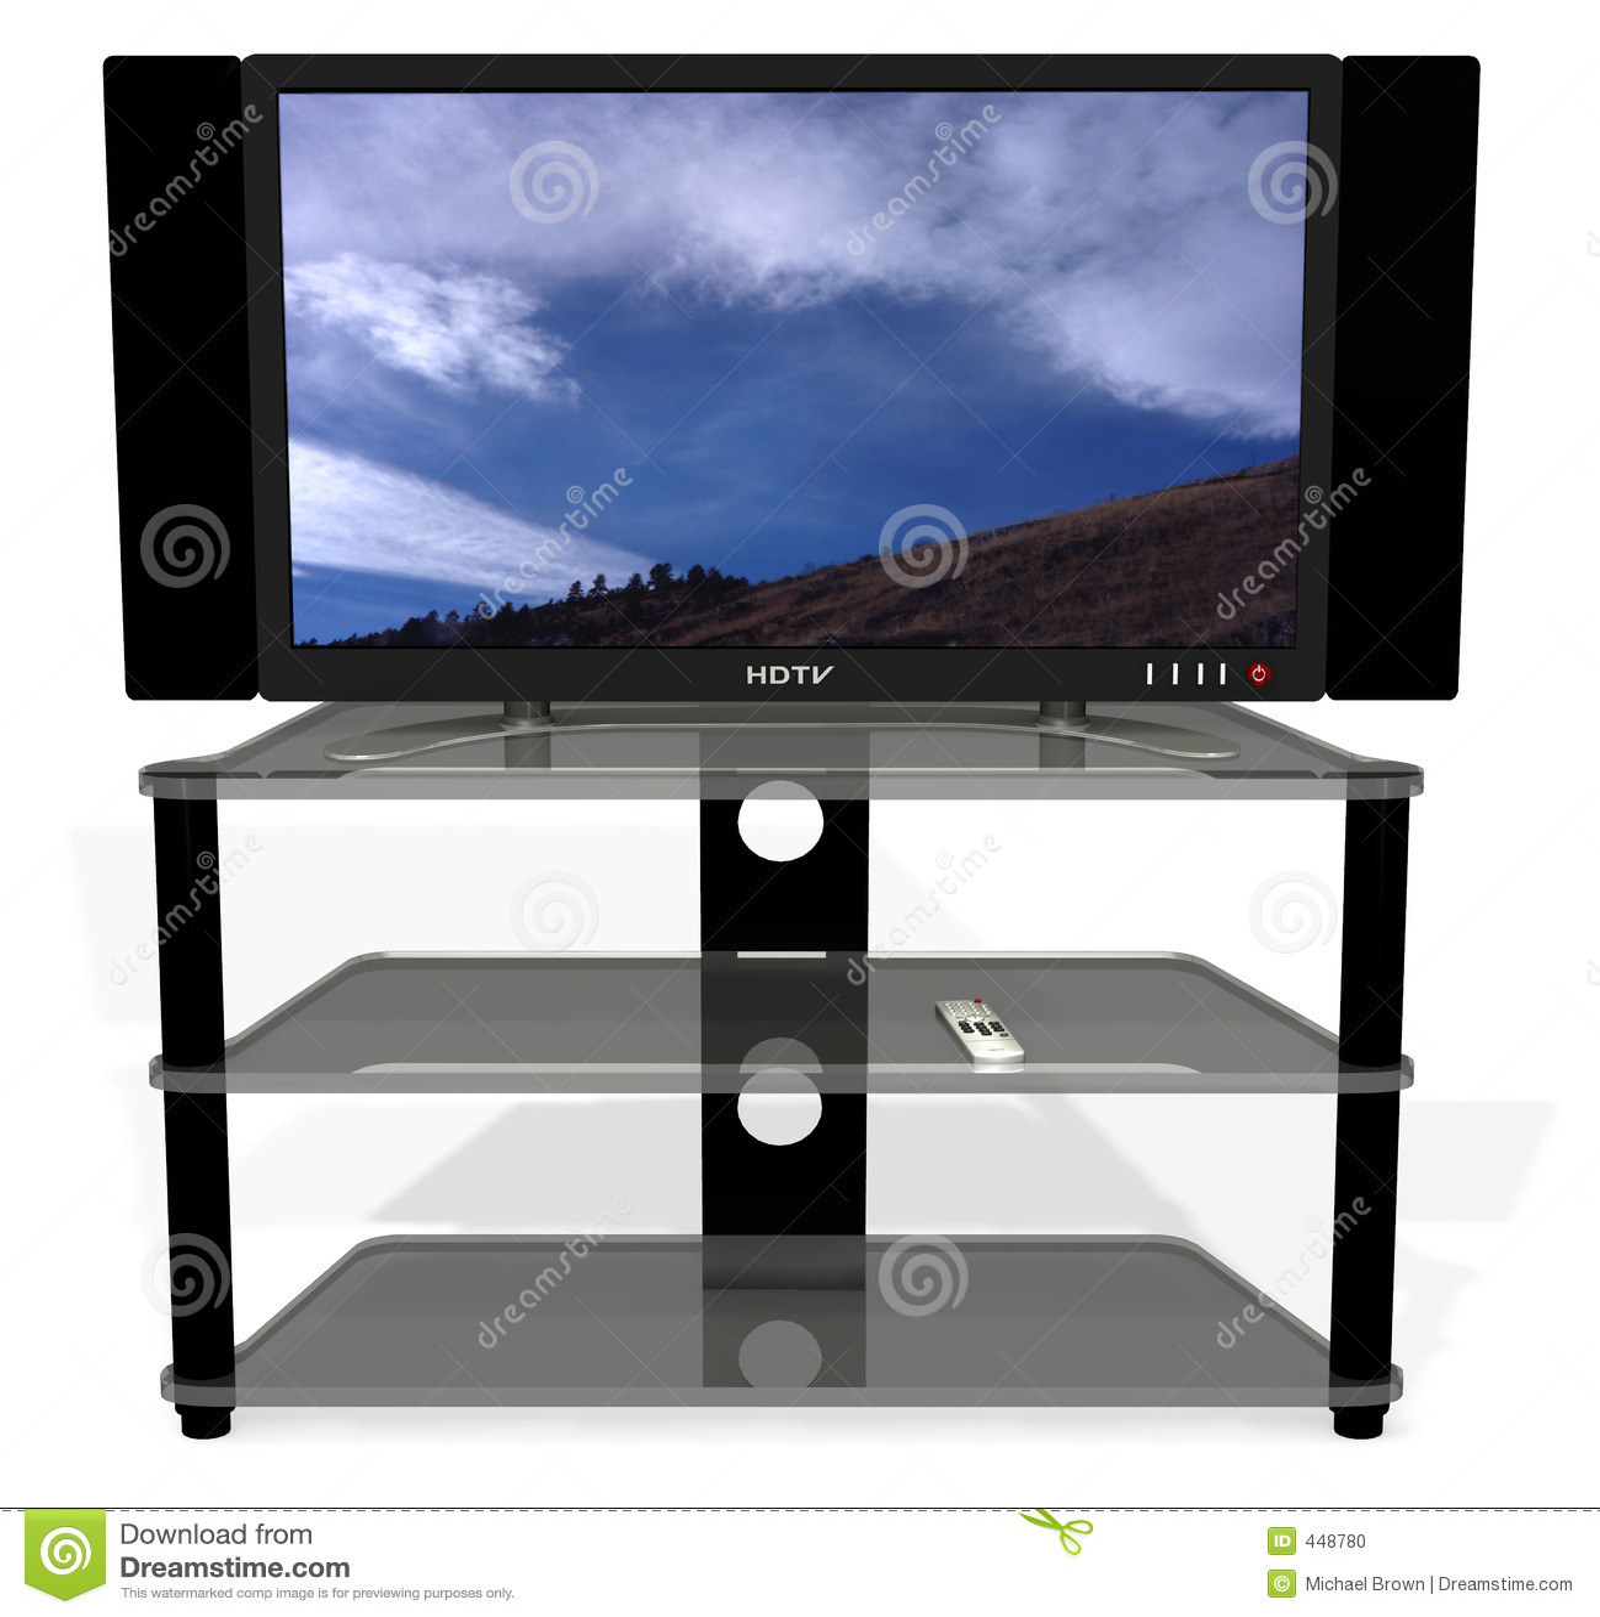 HDTV_Paths